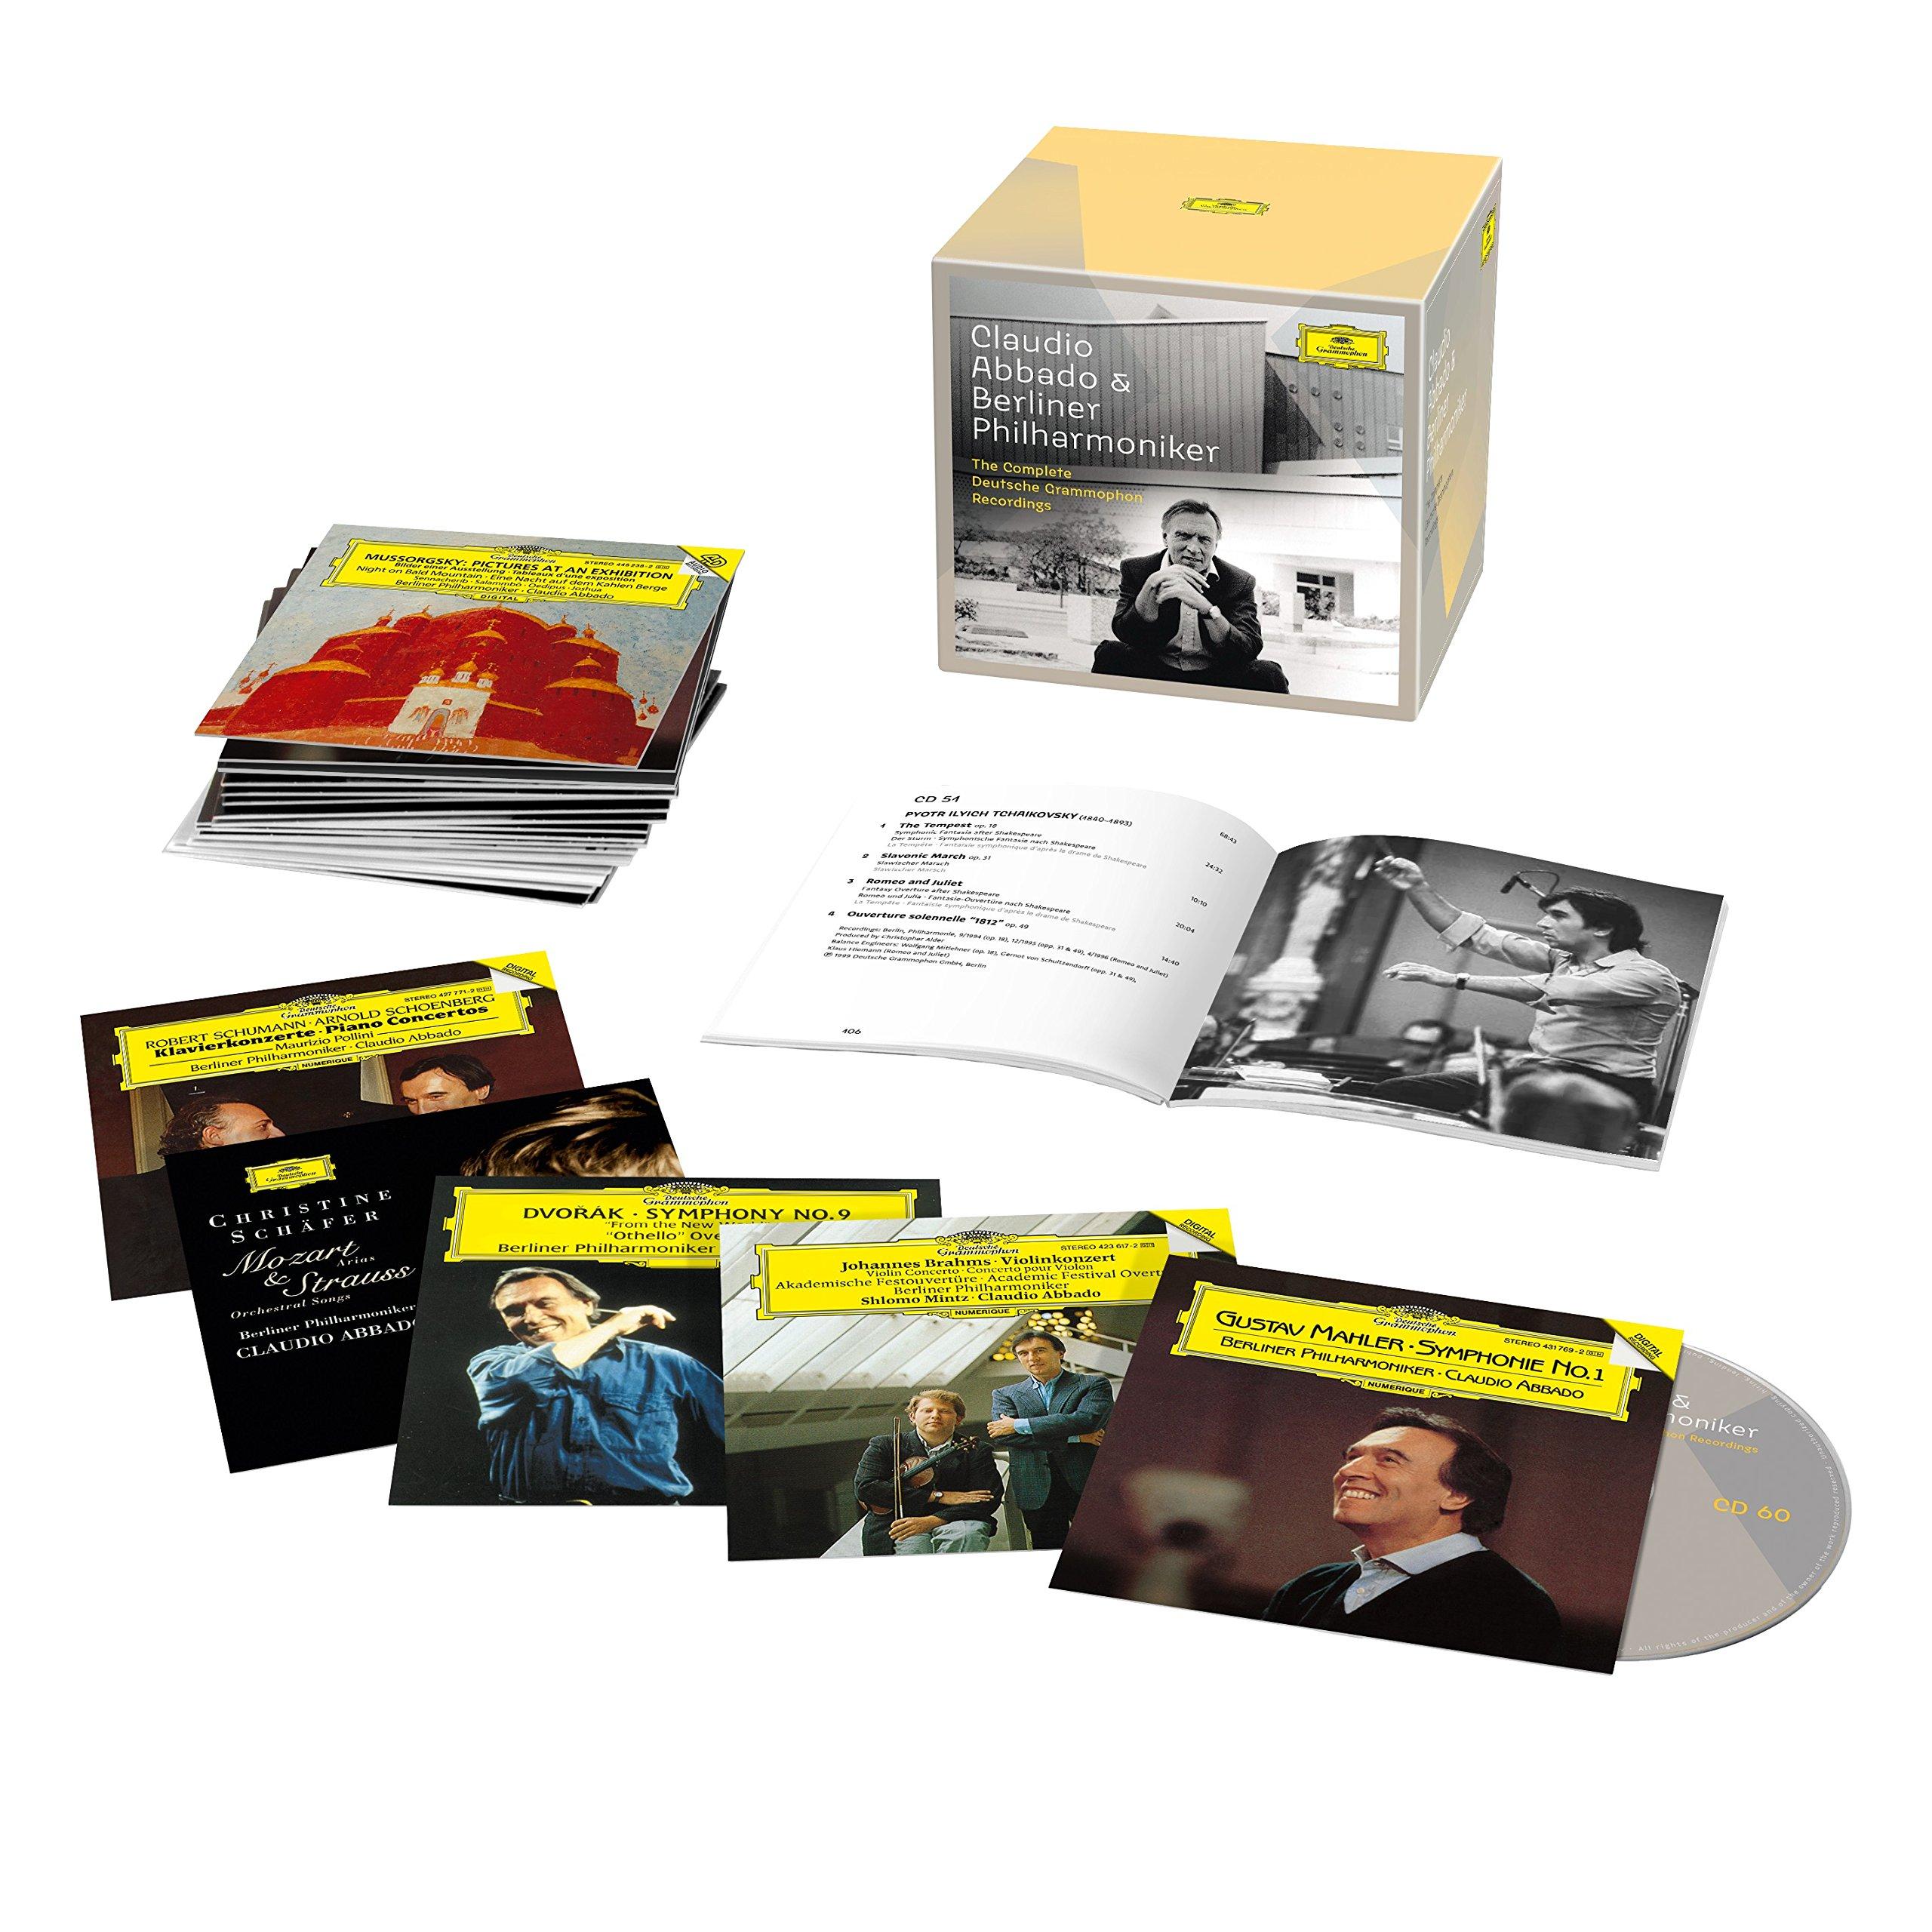 CD : Claudio Abbado - Complete Recordings On Deutsche Grammophon & Phili (Limited Edition, Boxed Set, 60PC)